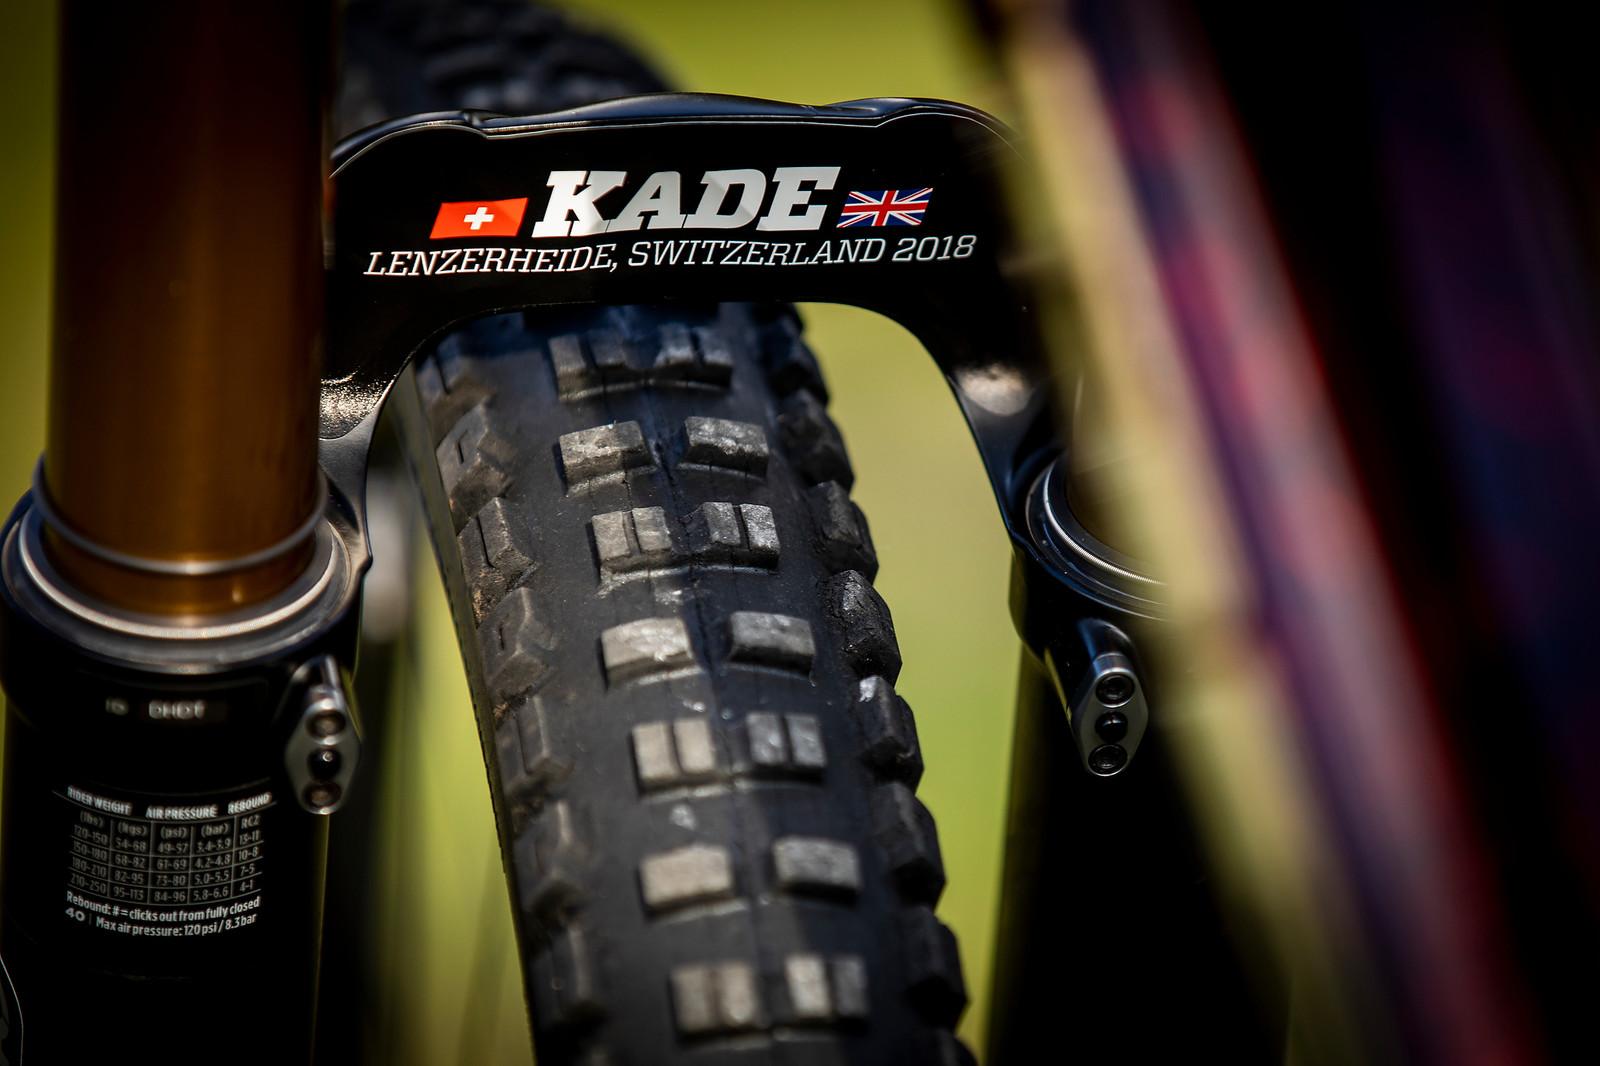 Kade is Koming? - WORLD CHAMPS BIKE - Kade Edwards' Trek Session - Mountain Biking Pictures - Vital MTB